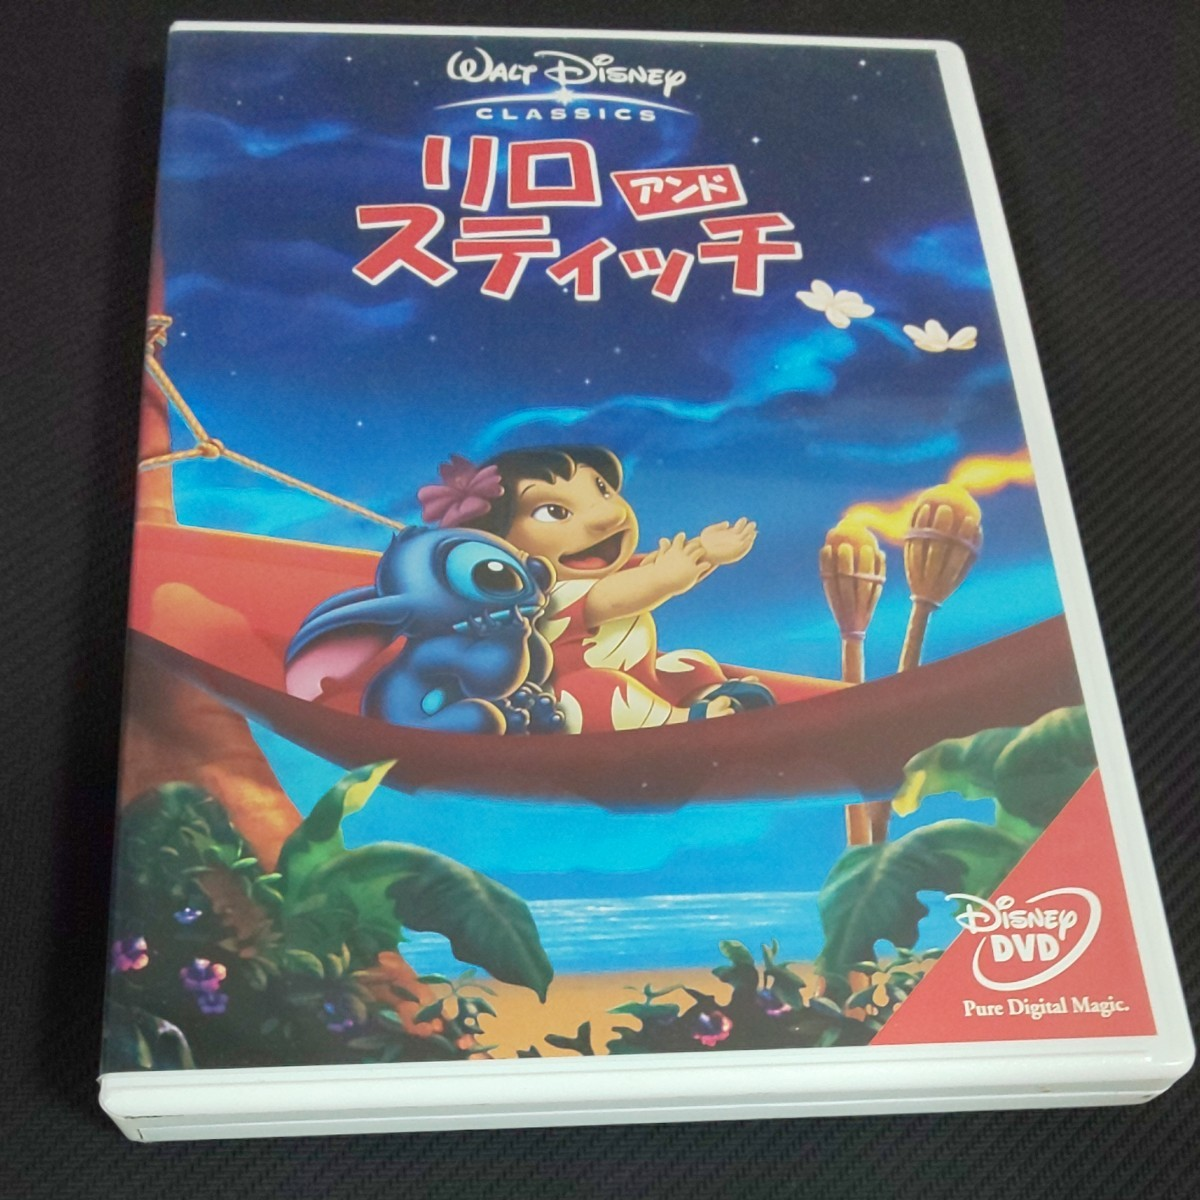 DVD リロアンドスティッチ ディズニー ディズニーDVD リロ&スティッチ